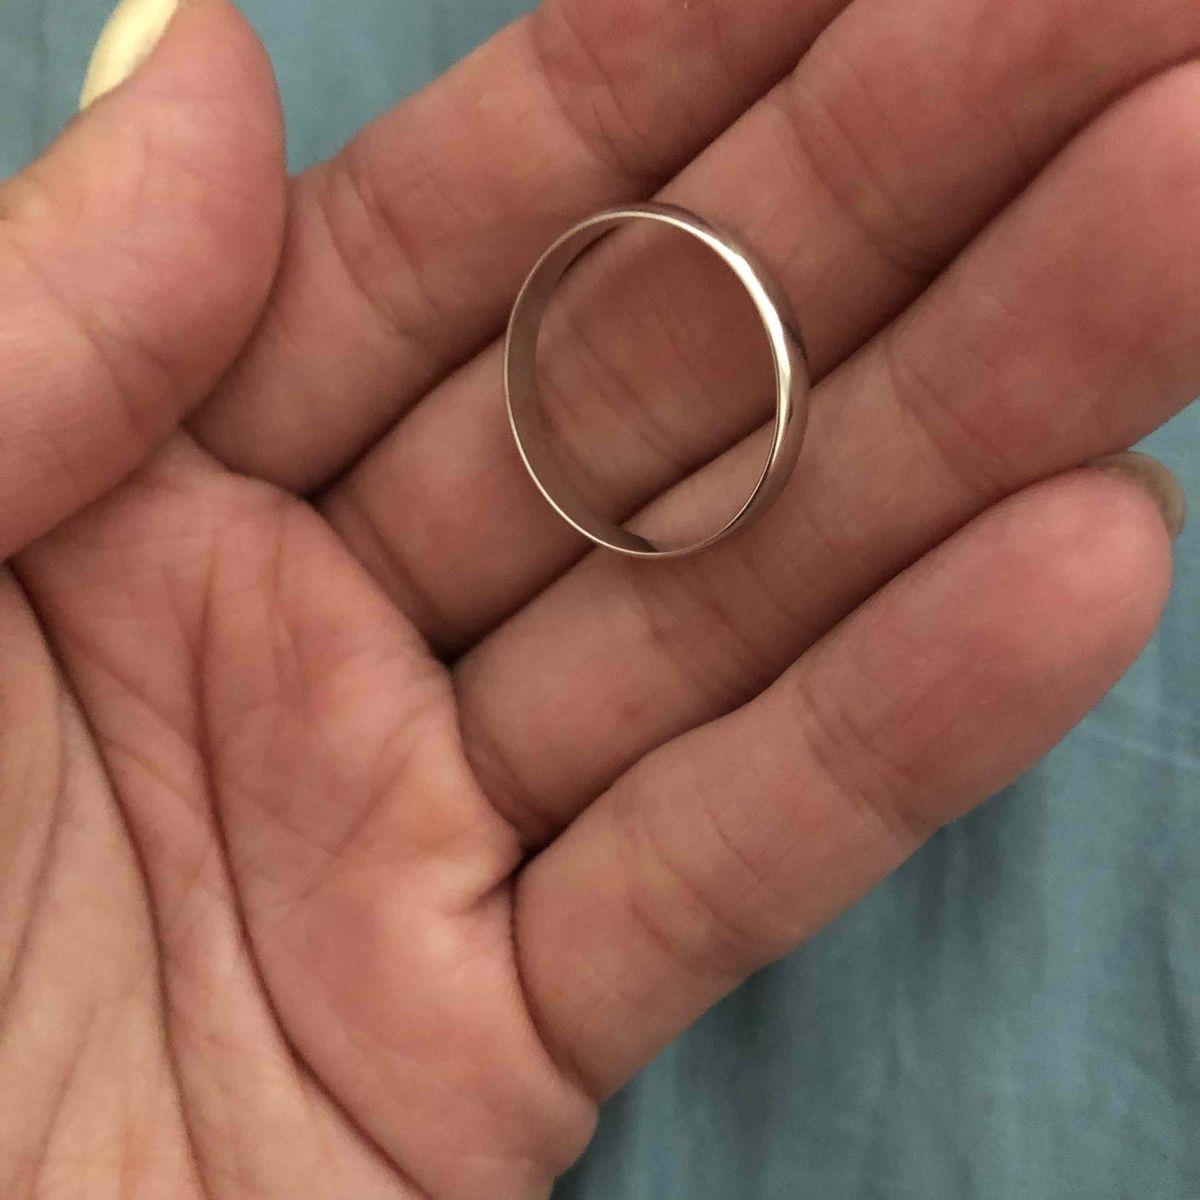 Муж носит кольцо